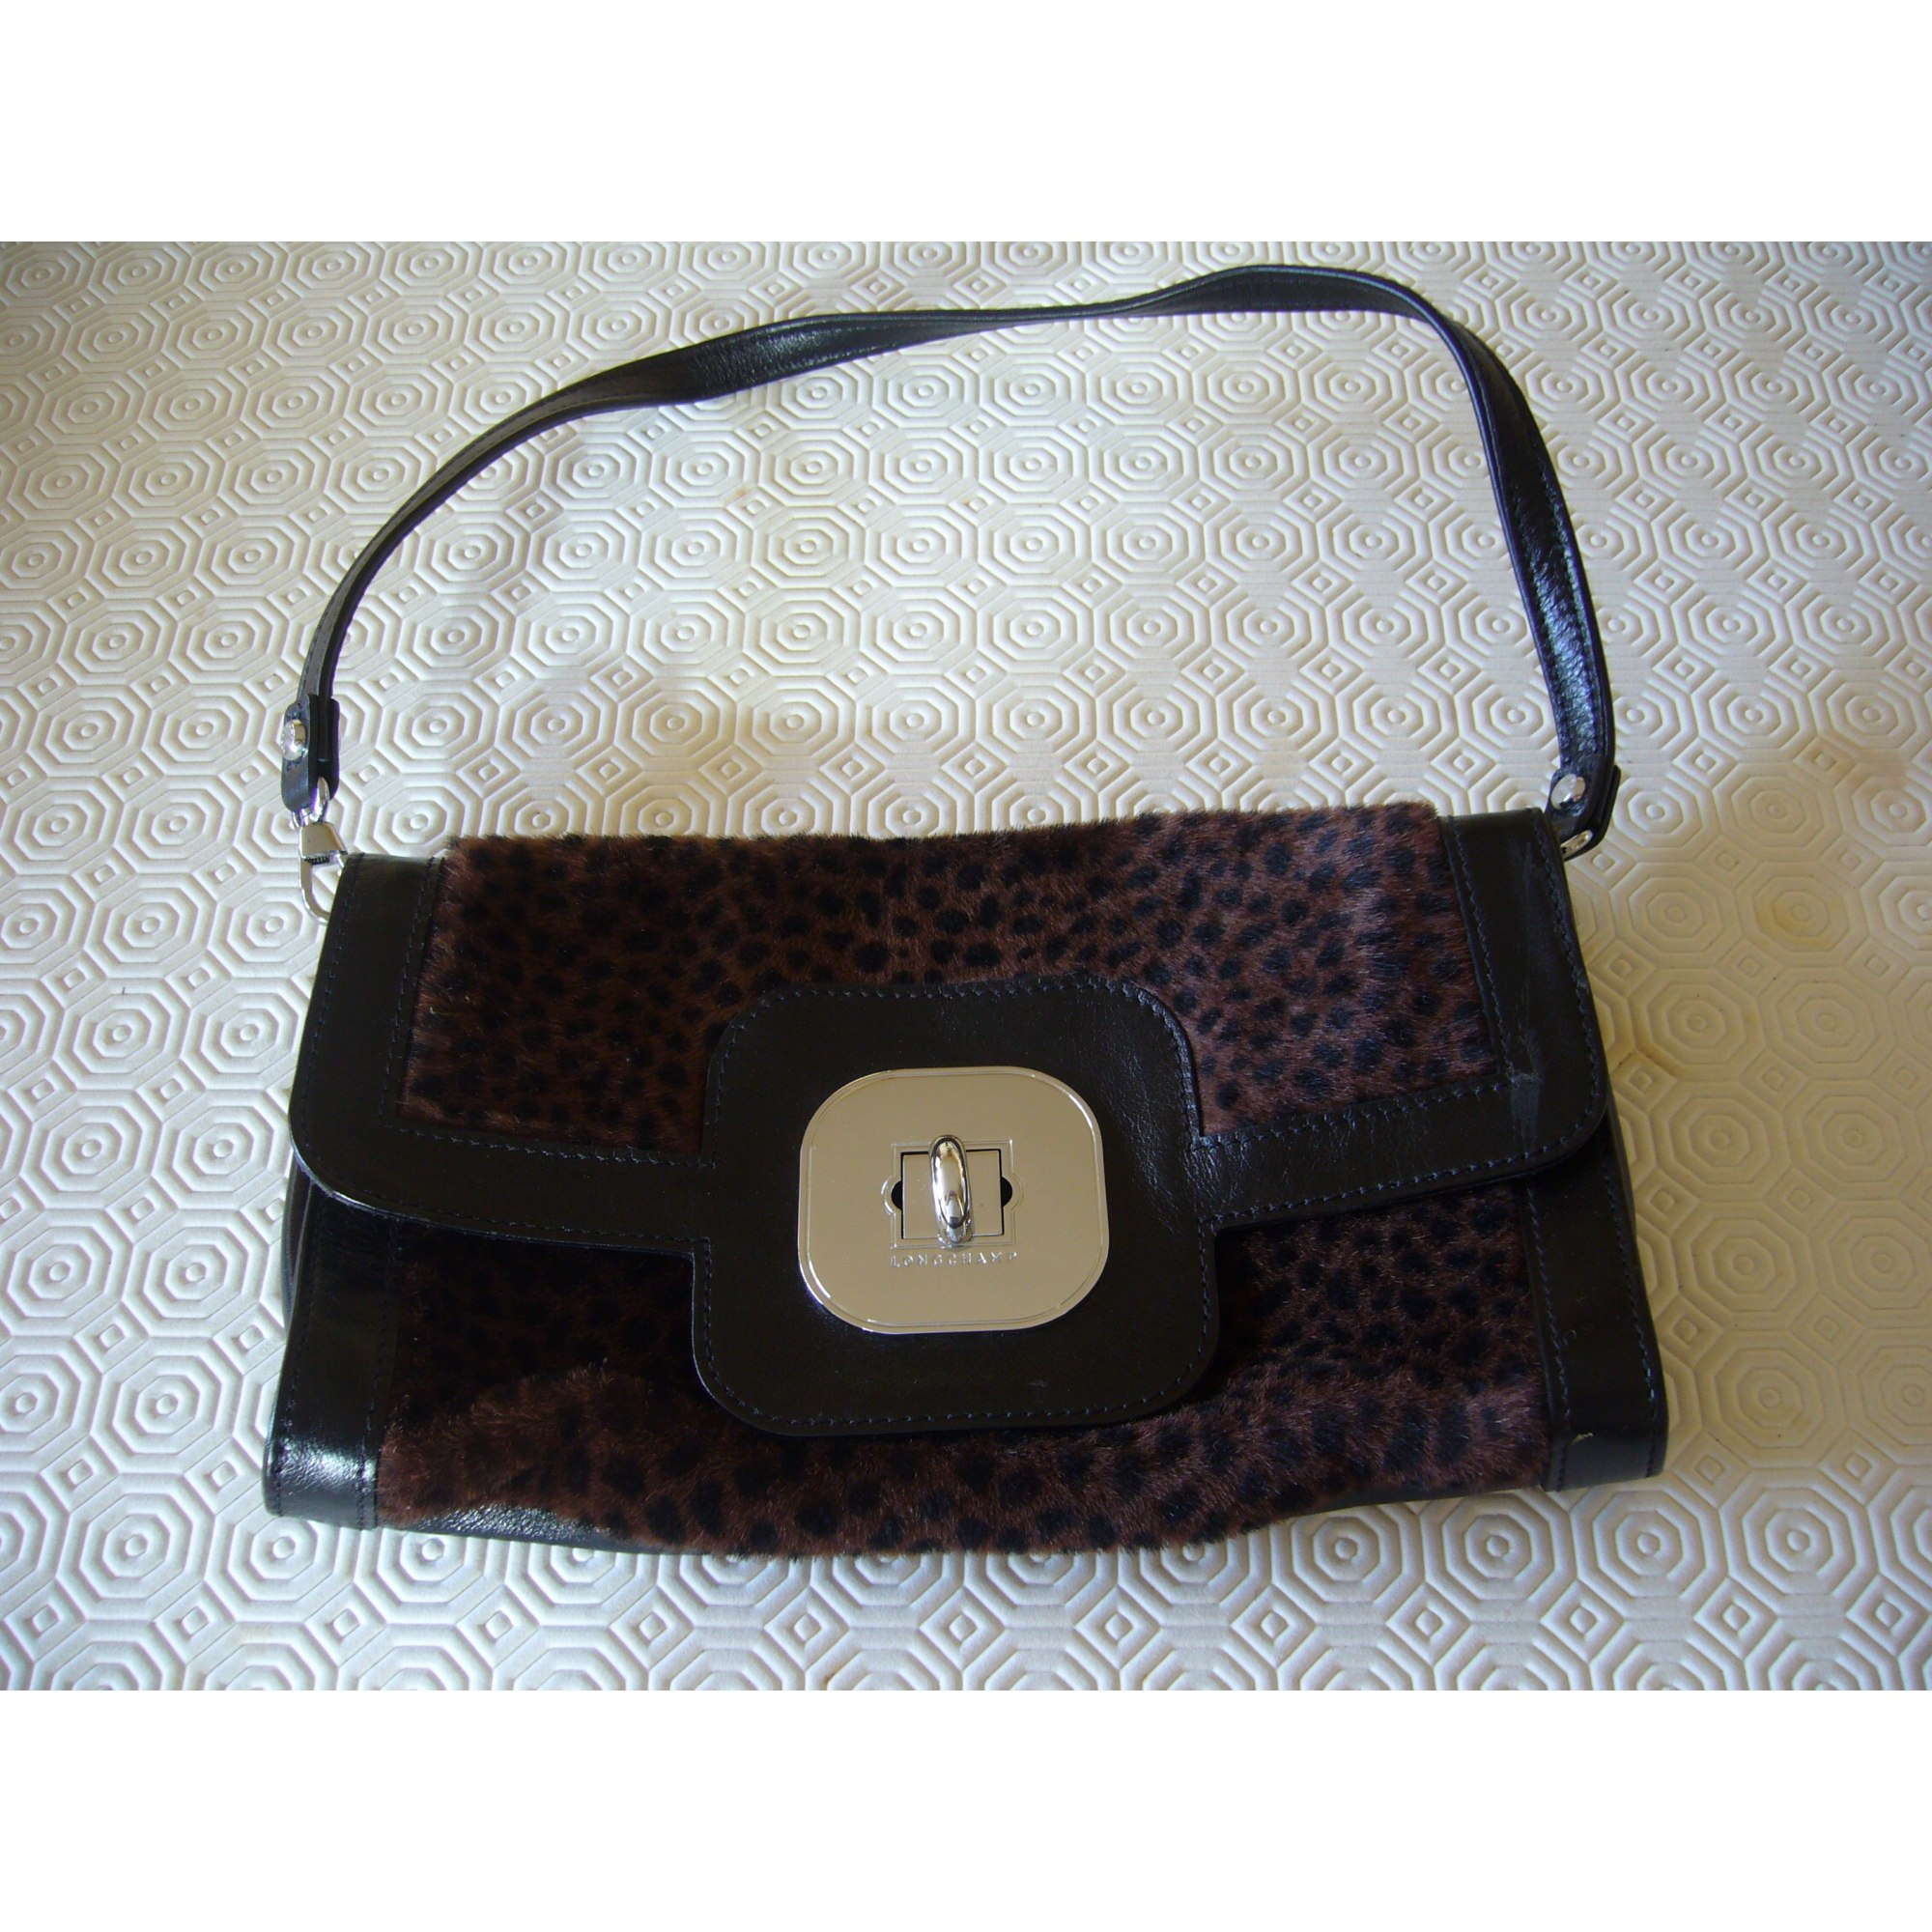 b88847d4a5 Sac pochette en cuir LONGCHAMP marron - 7432969